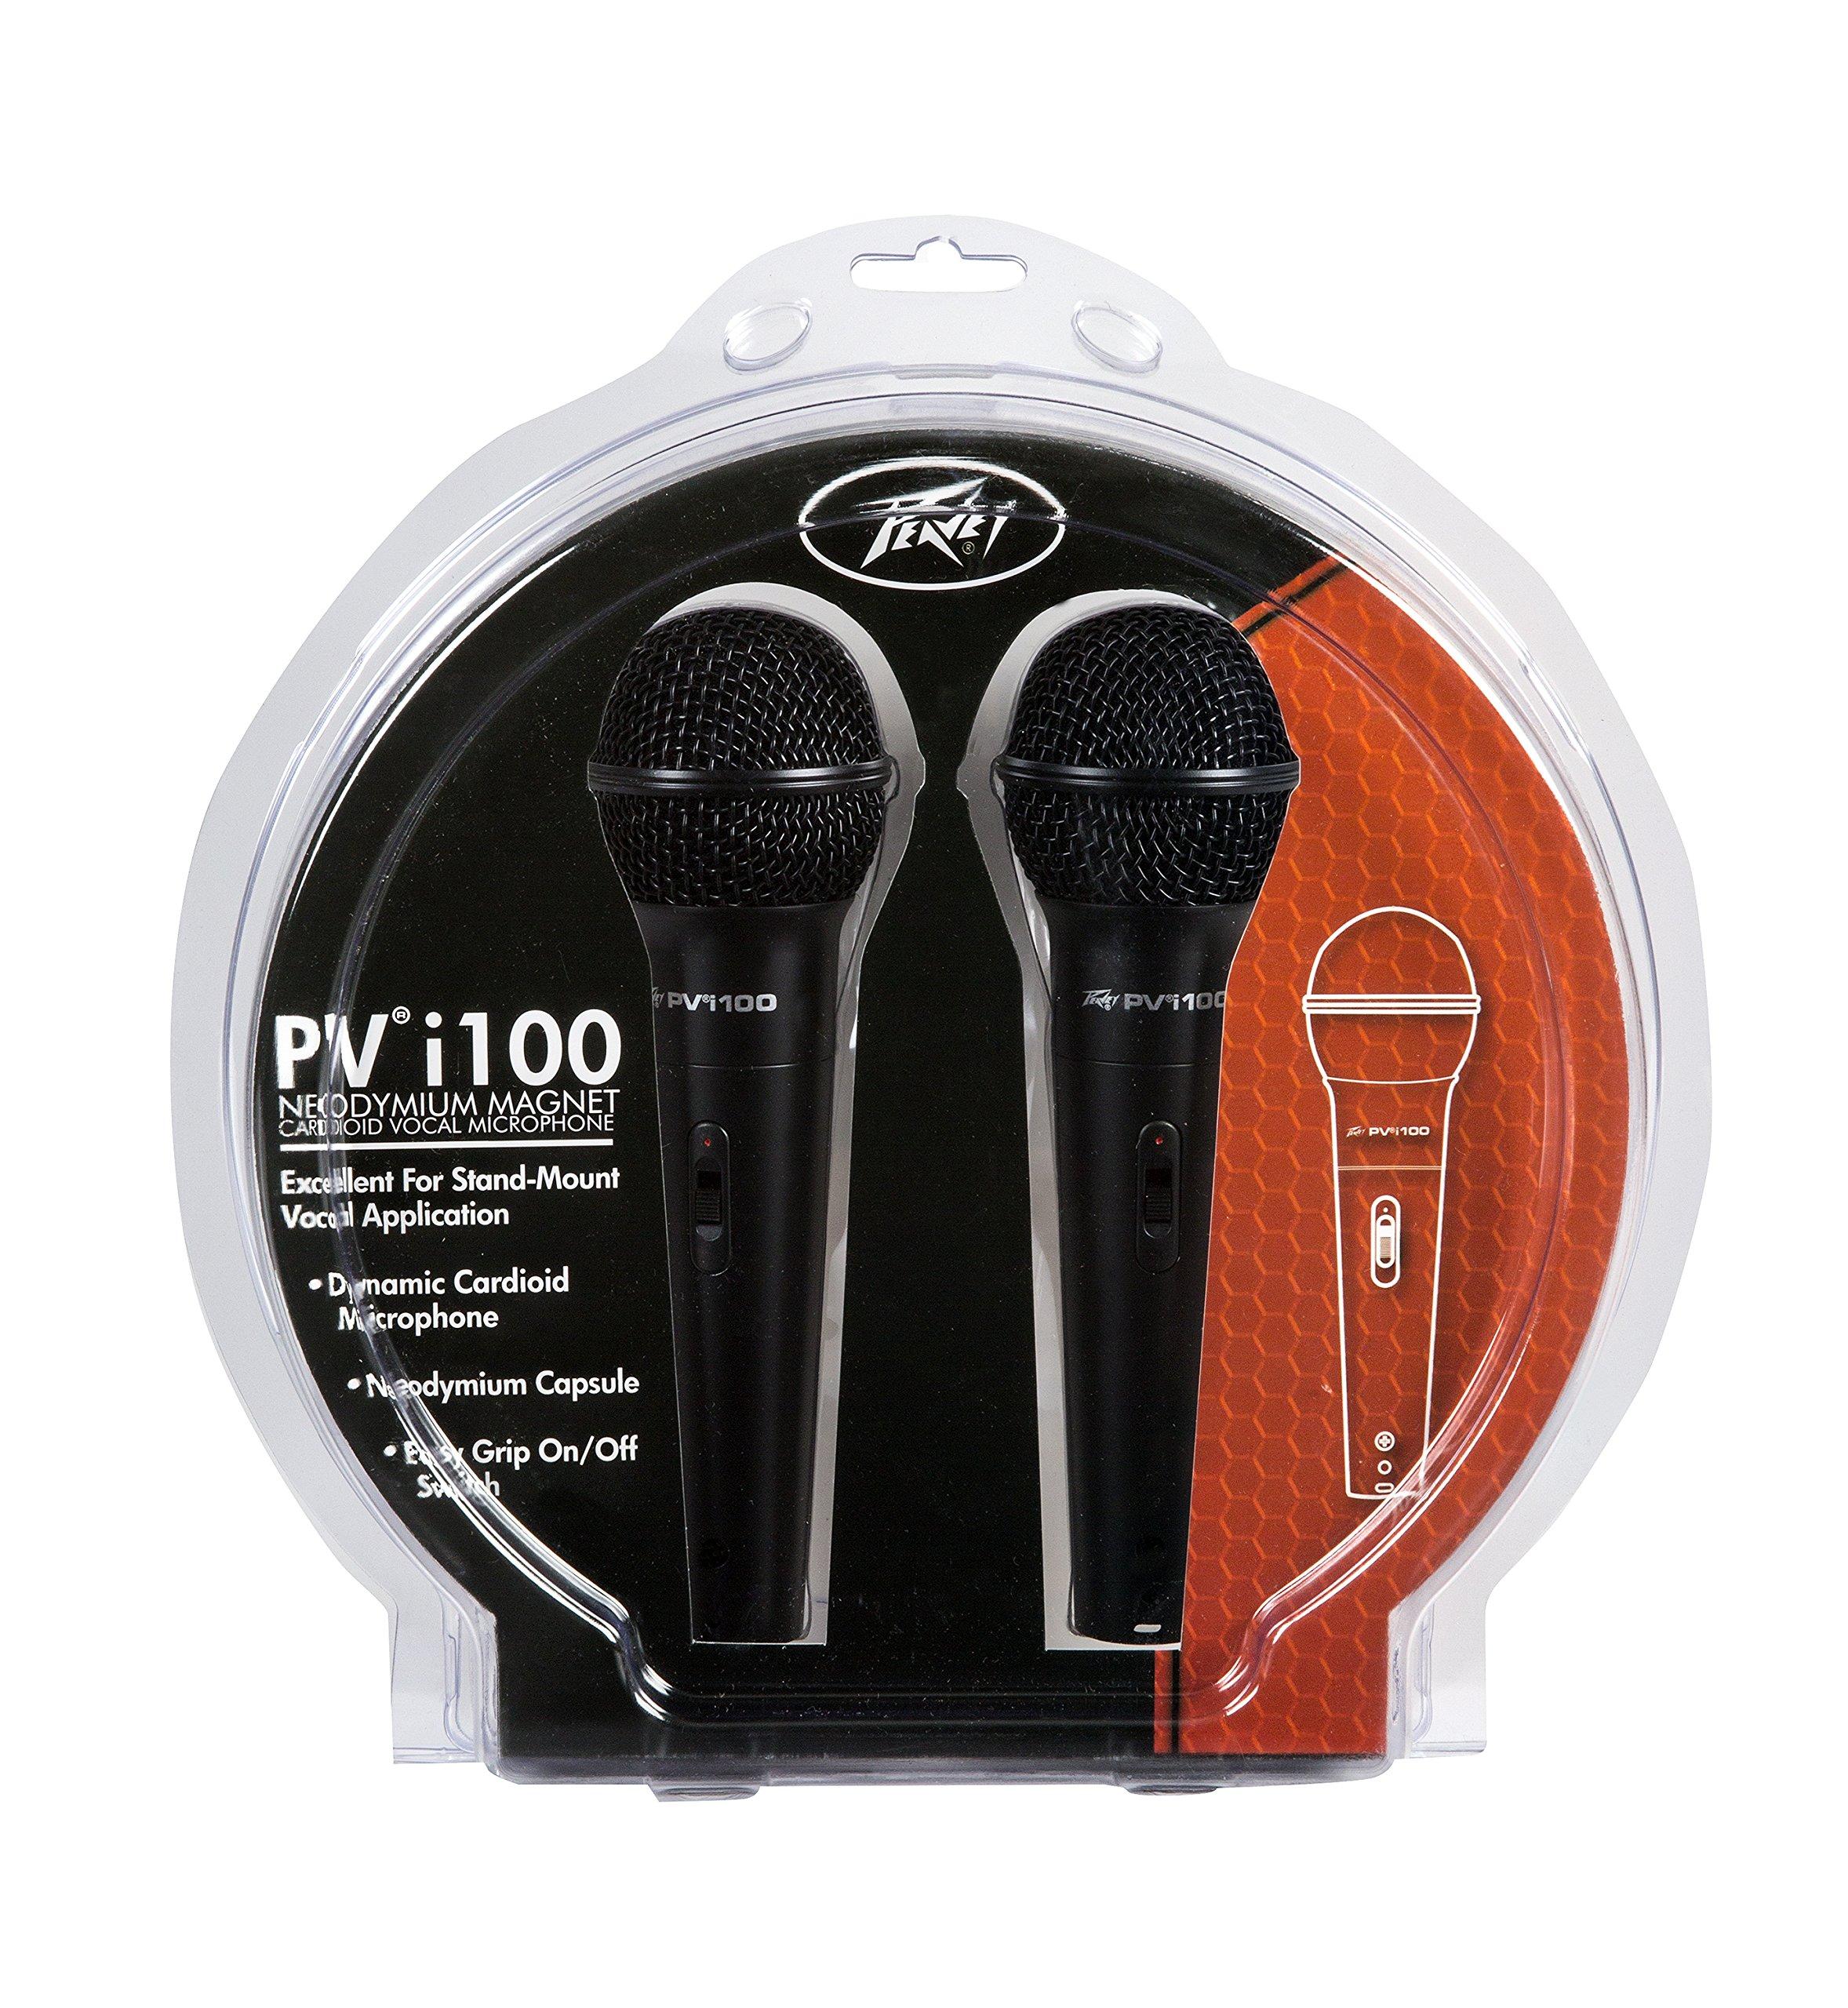 Microfono Peavey Pvi 100 - 2-Pack Dynamic Cardiod s...